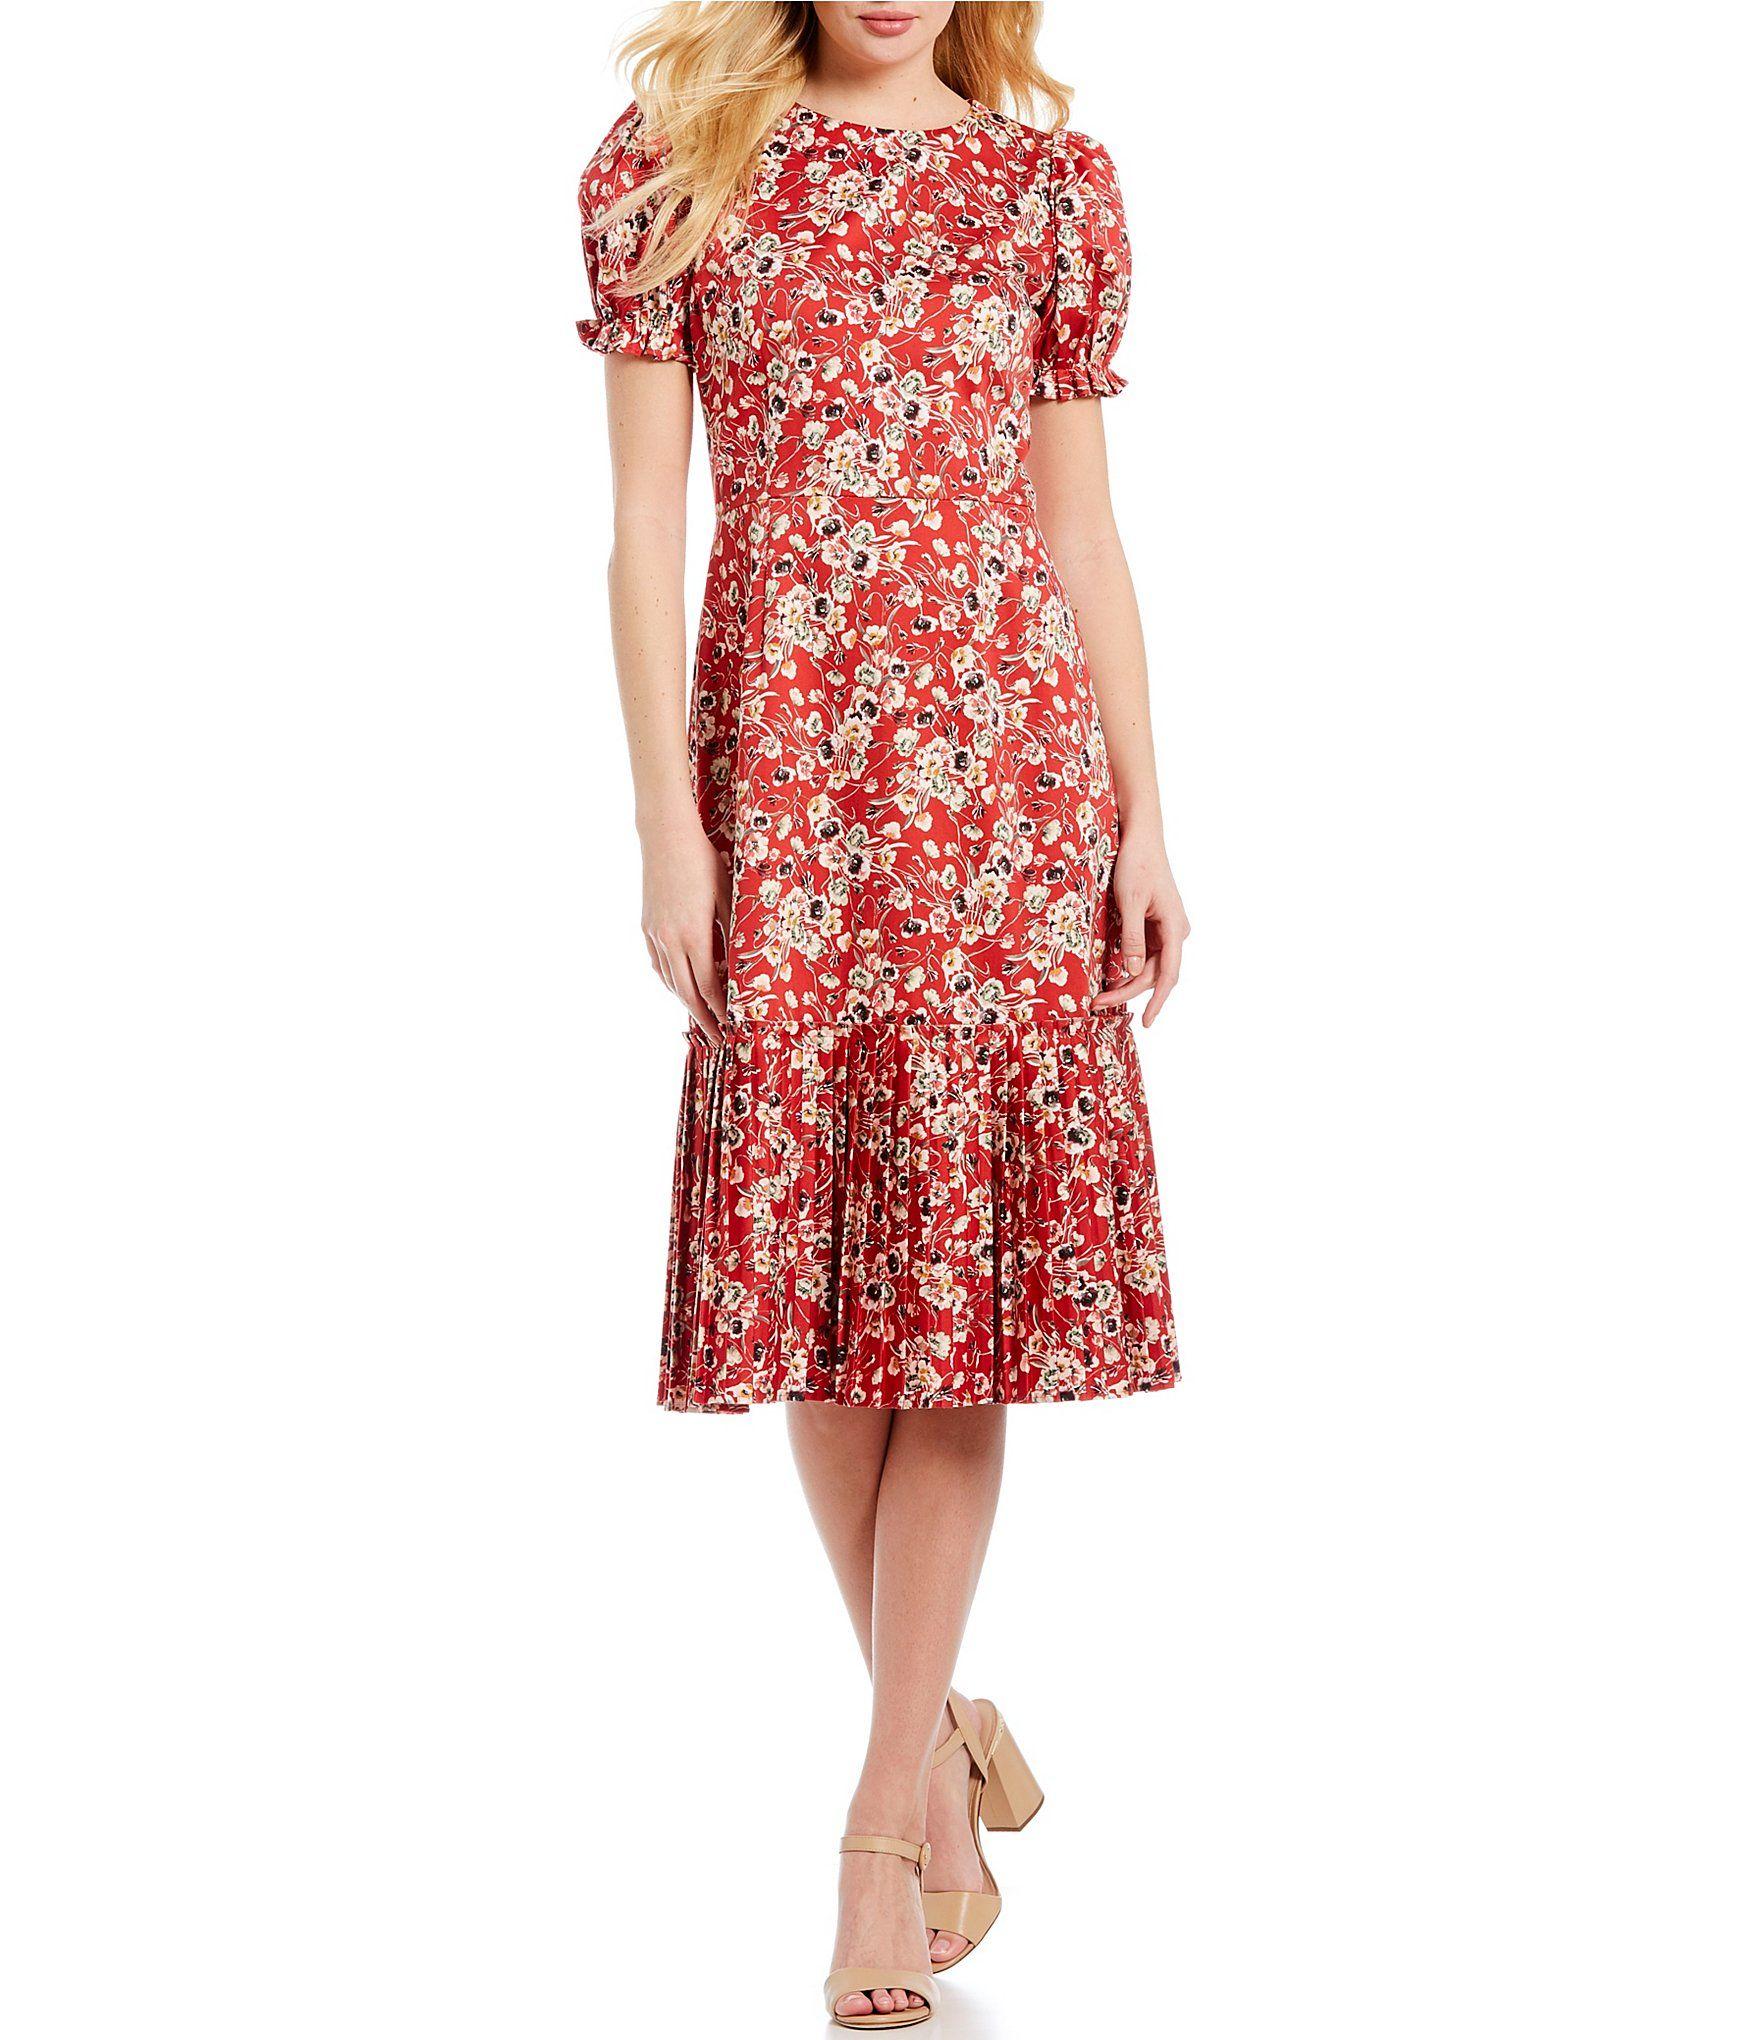 9b379c84923 Antonio Melani Chloe Pleated Floral Print Puff Sleeve Midi Dress  Dillards